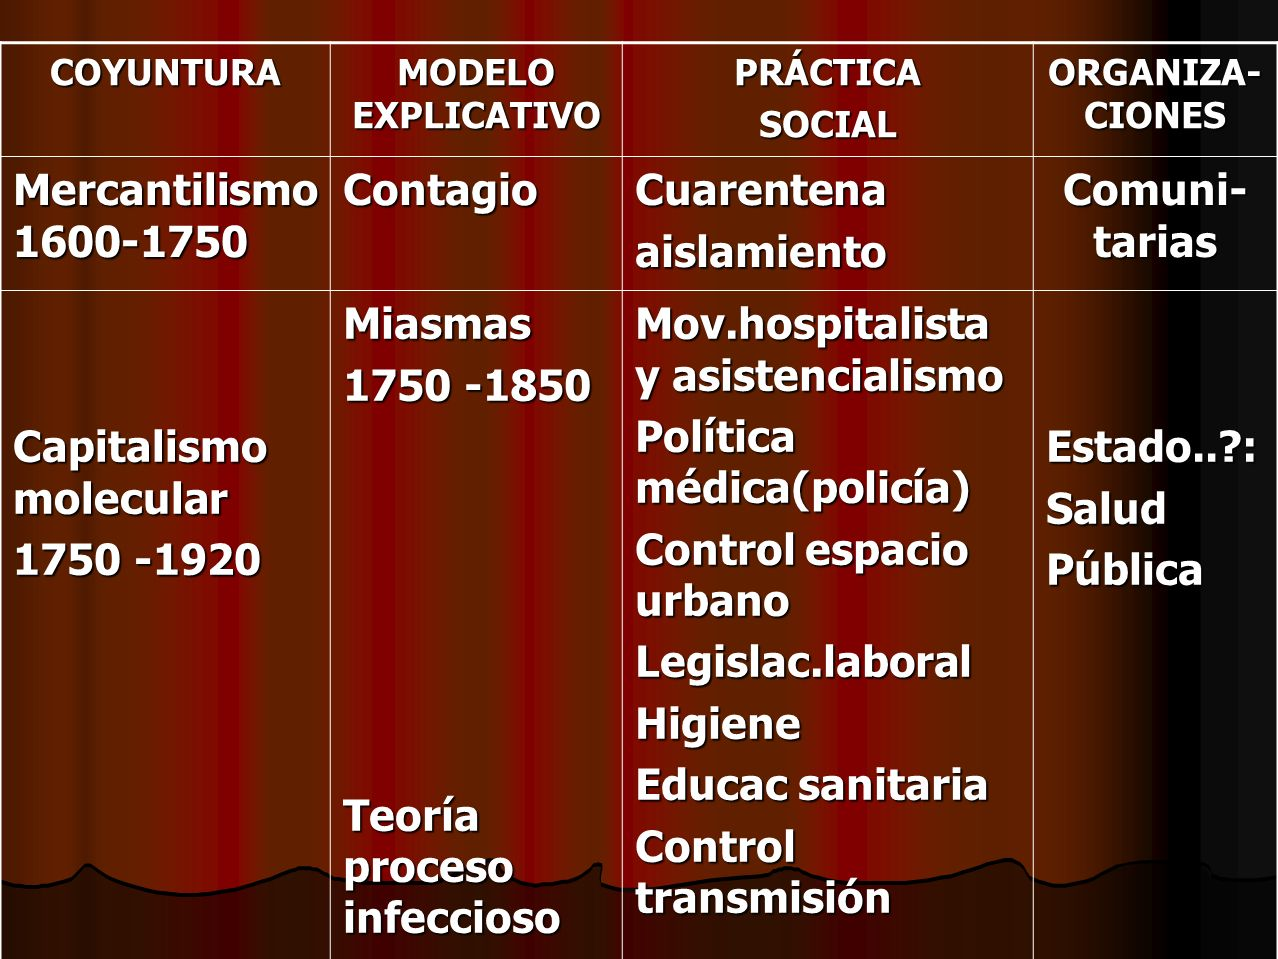 COYUNTURA MODELO EXPLICATIVO PRÁCTICASOCIAL ORGANIZA- CIONES Mercantilismo 1600-1750 ContagioCuarentenaaislamiento Comuni- tarias Capitalismo molecula